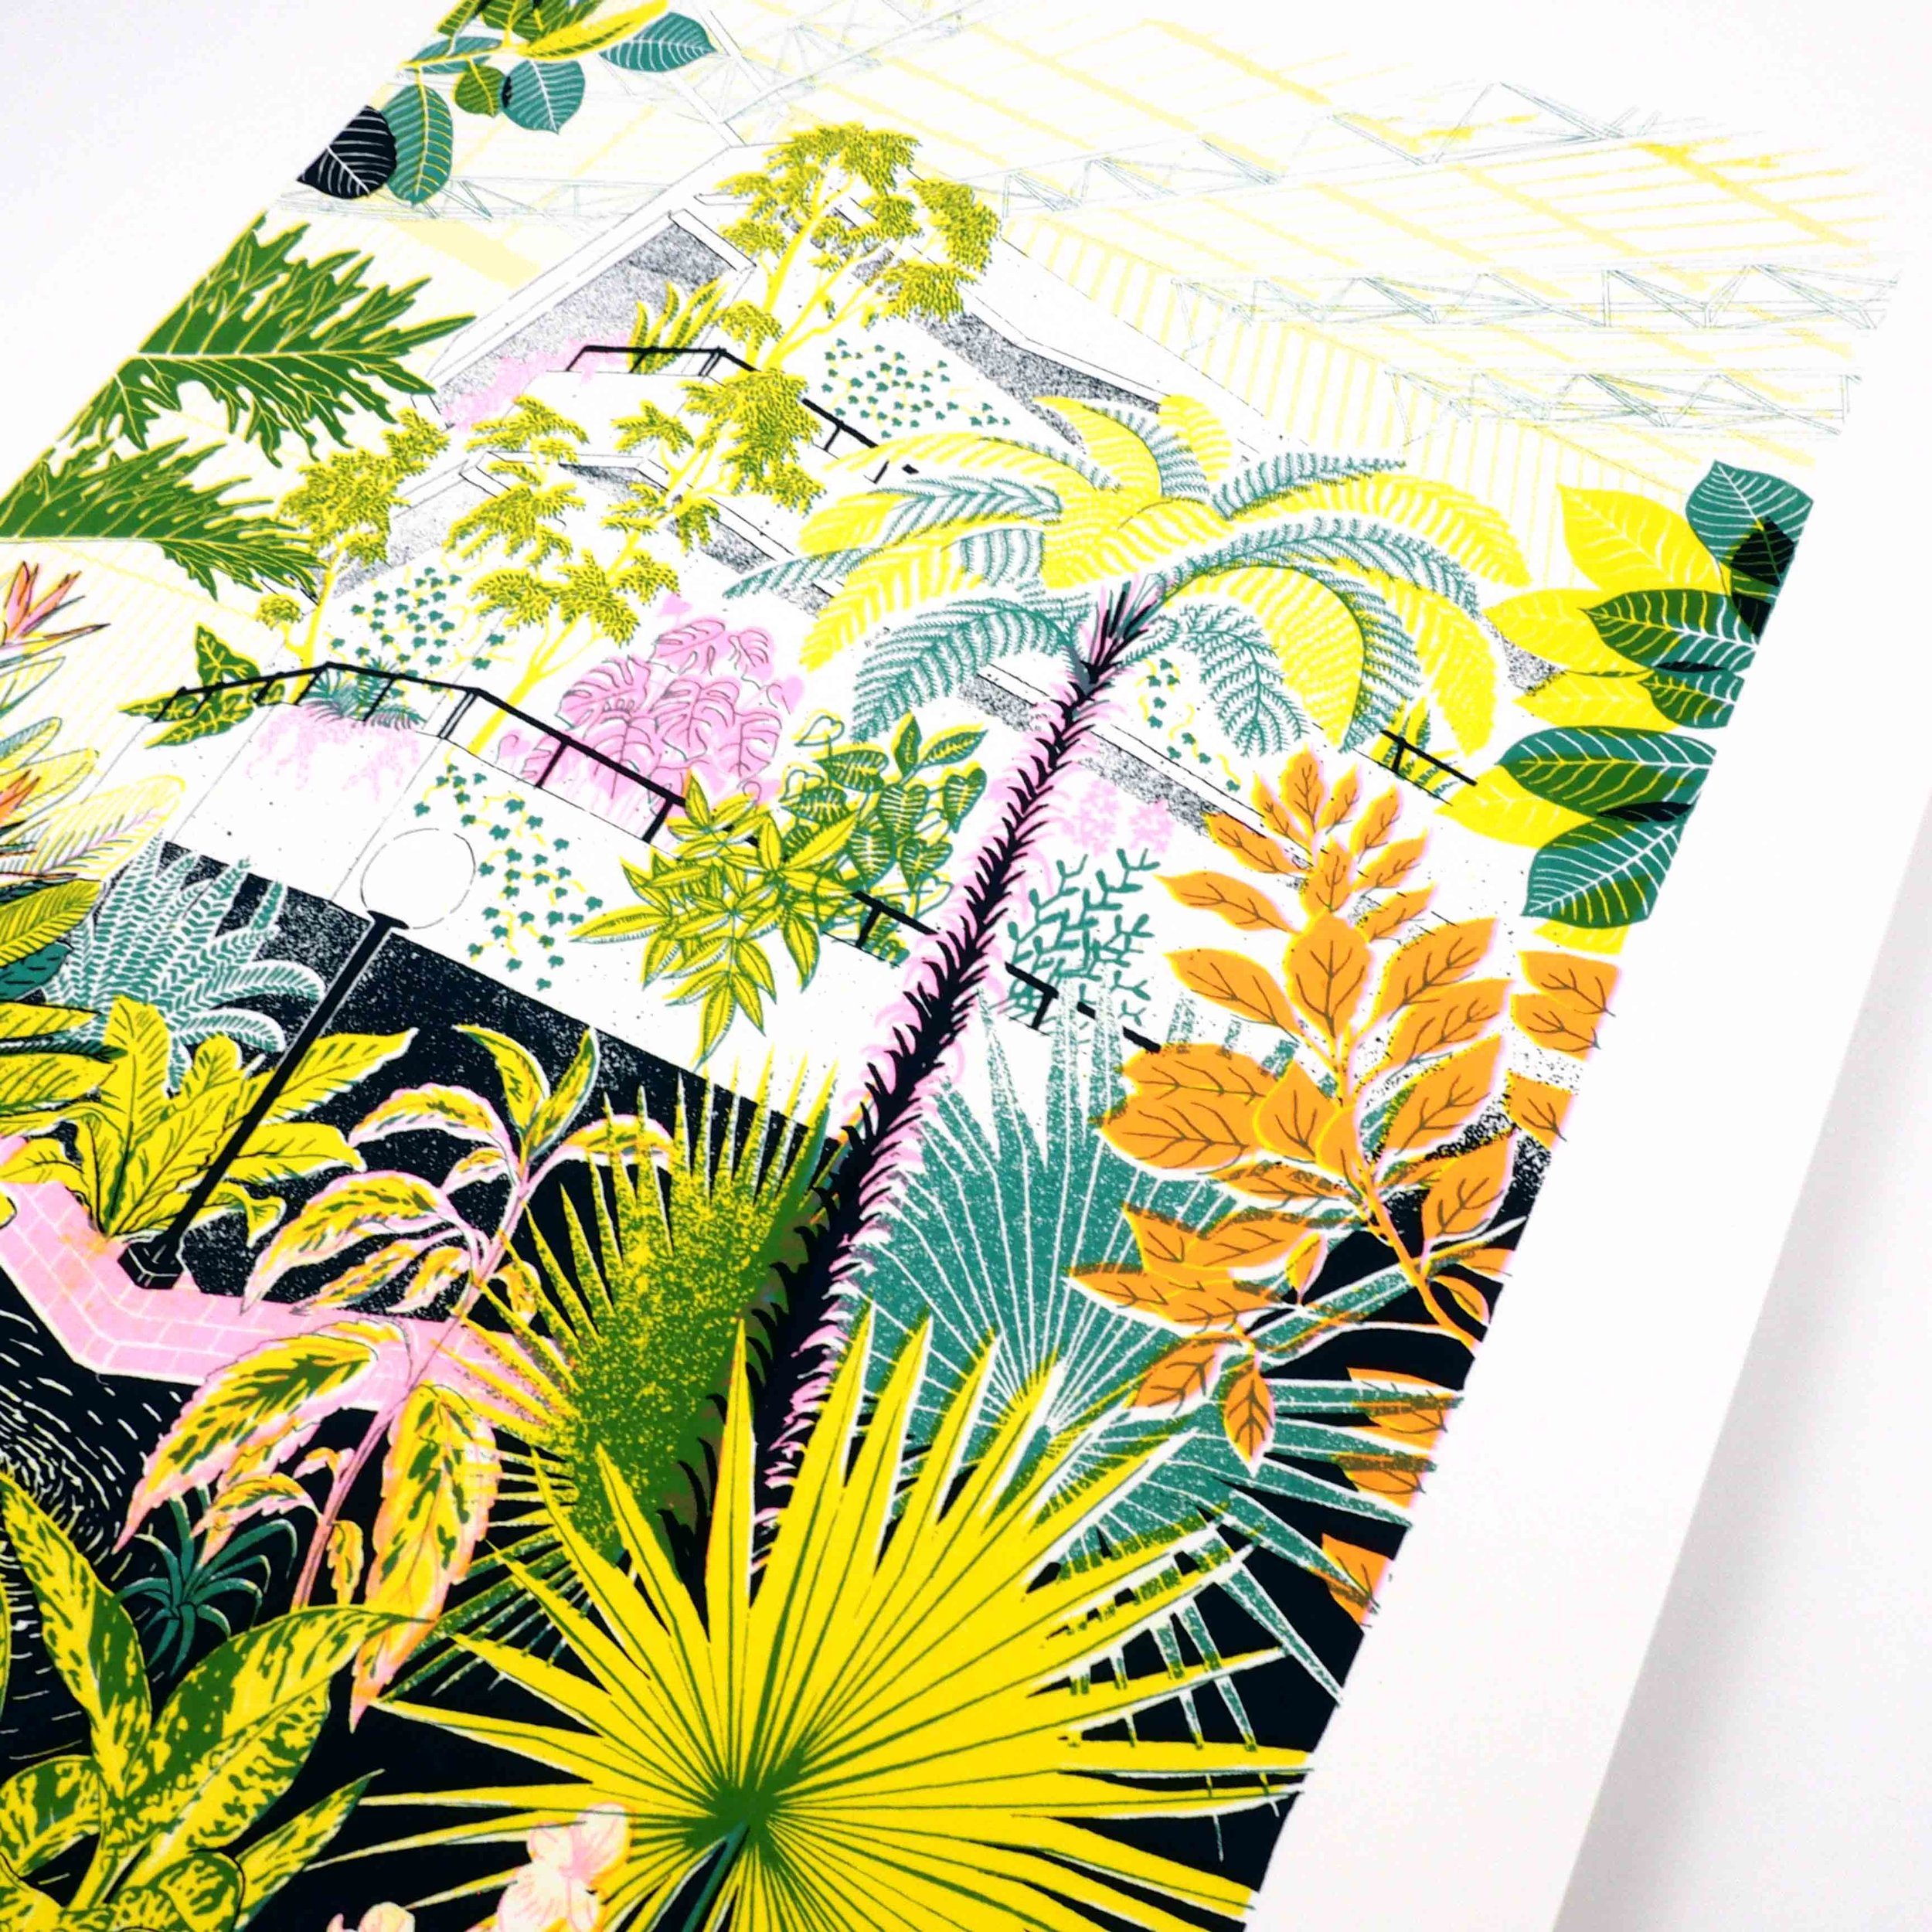 Barbican-Conservatory-Jungle-Screen-Print-2sm.jpg